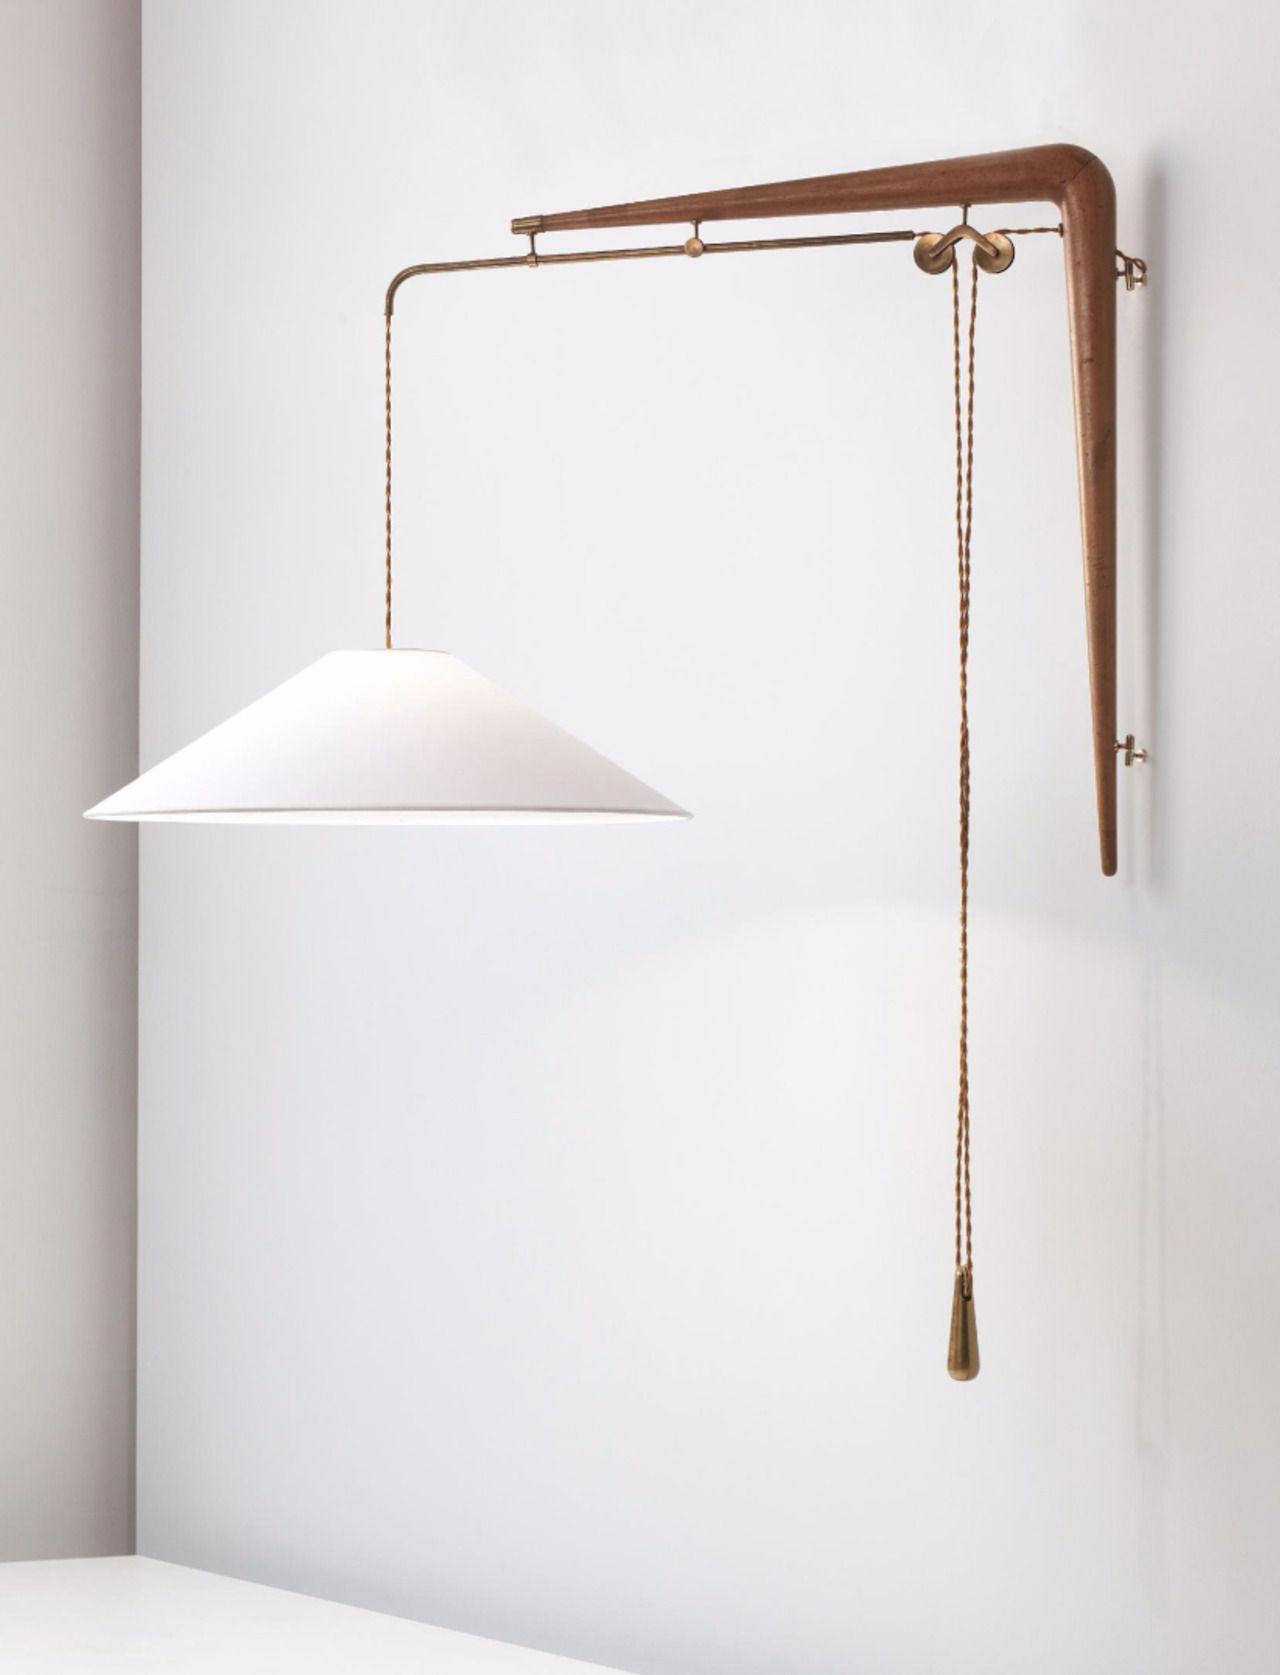 Gino sarfatti adjustable wall light model no c